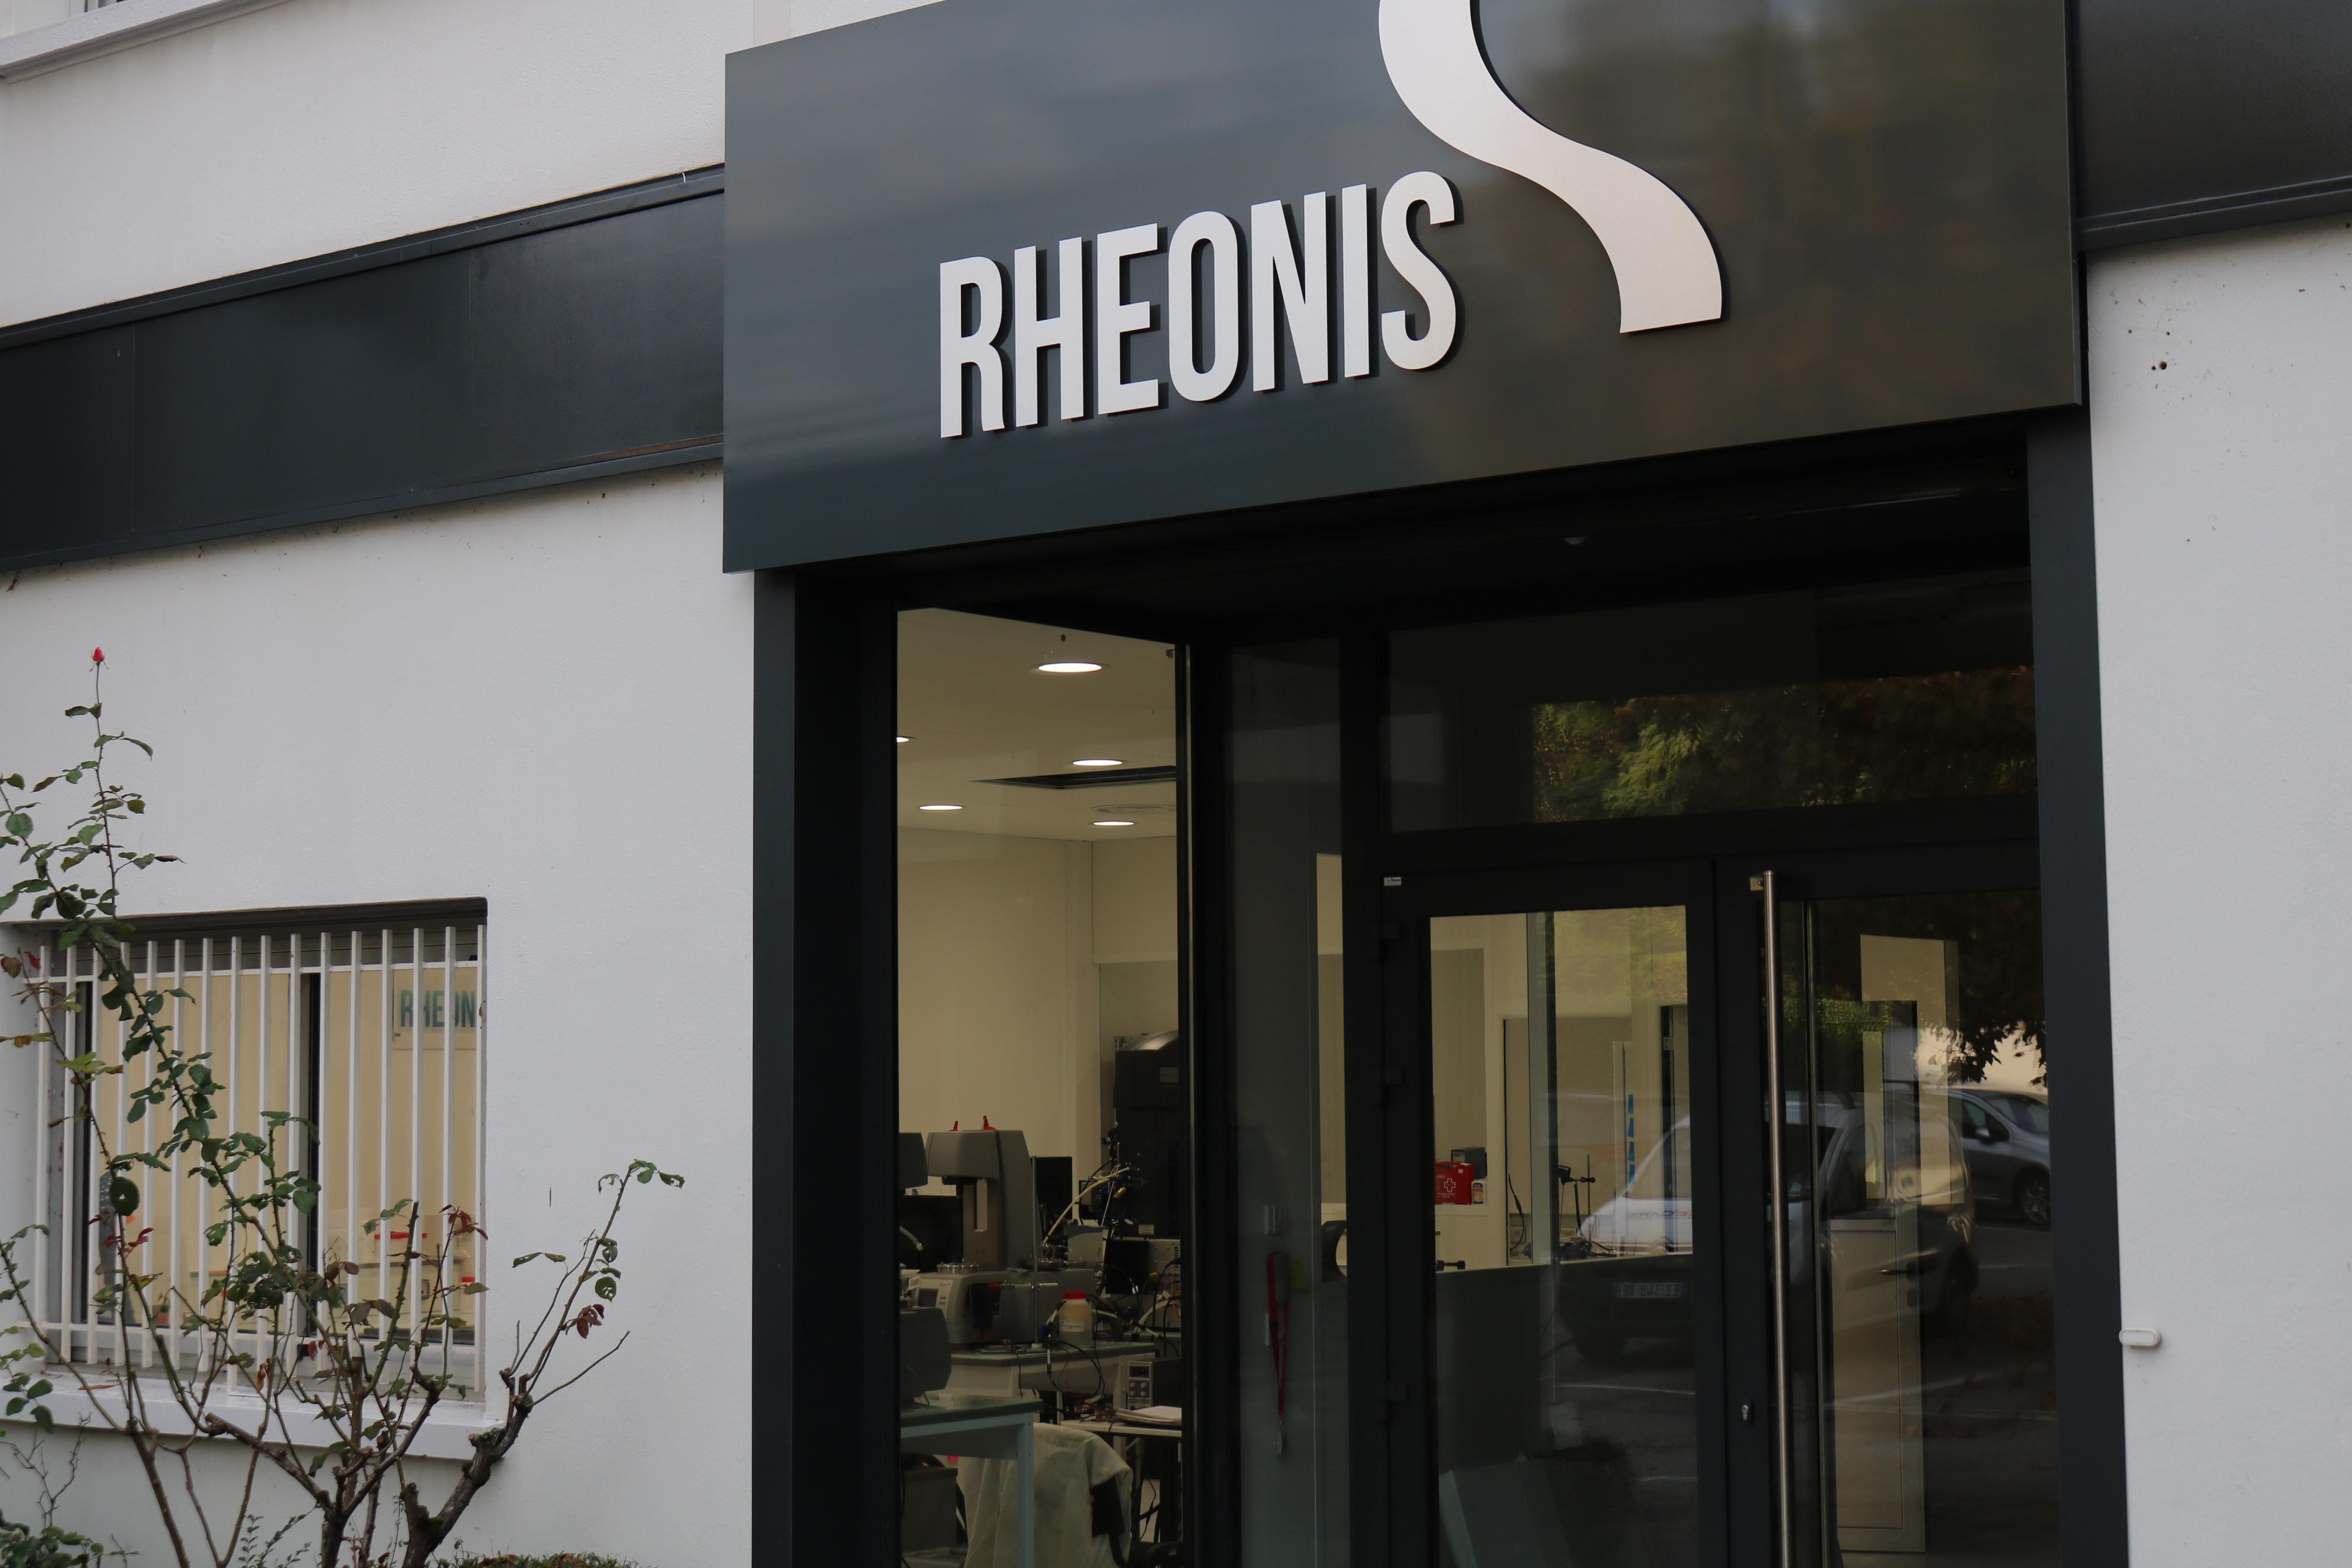 locaux-rheonis